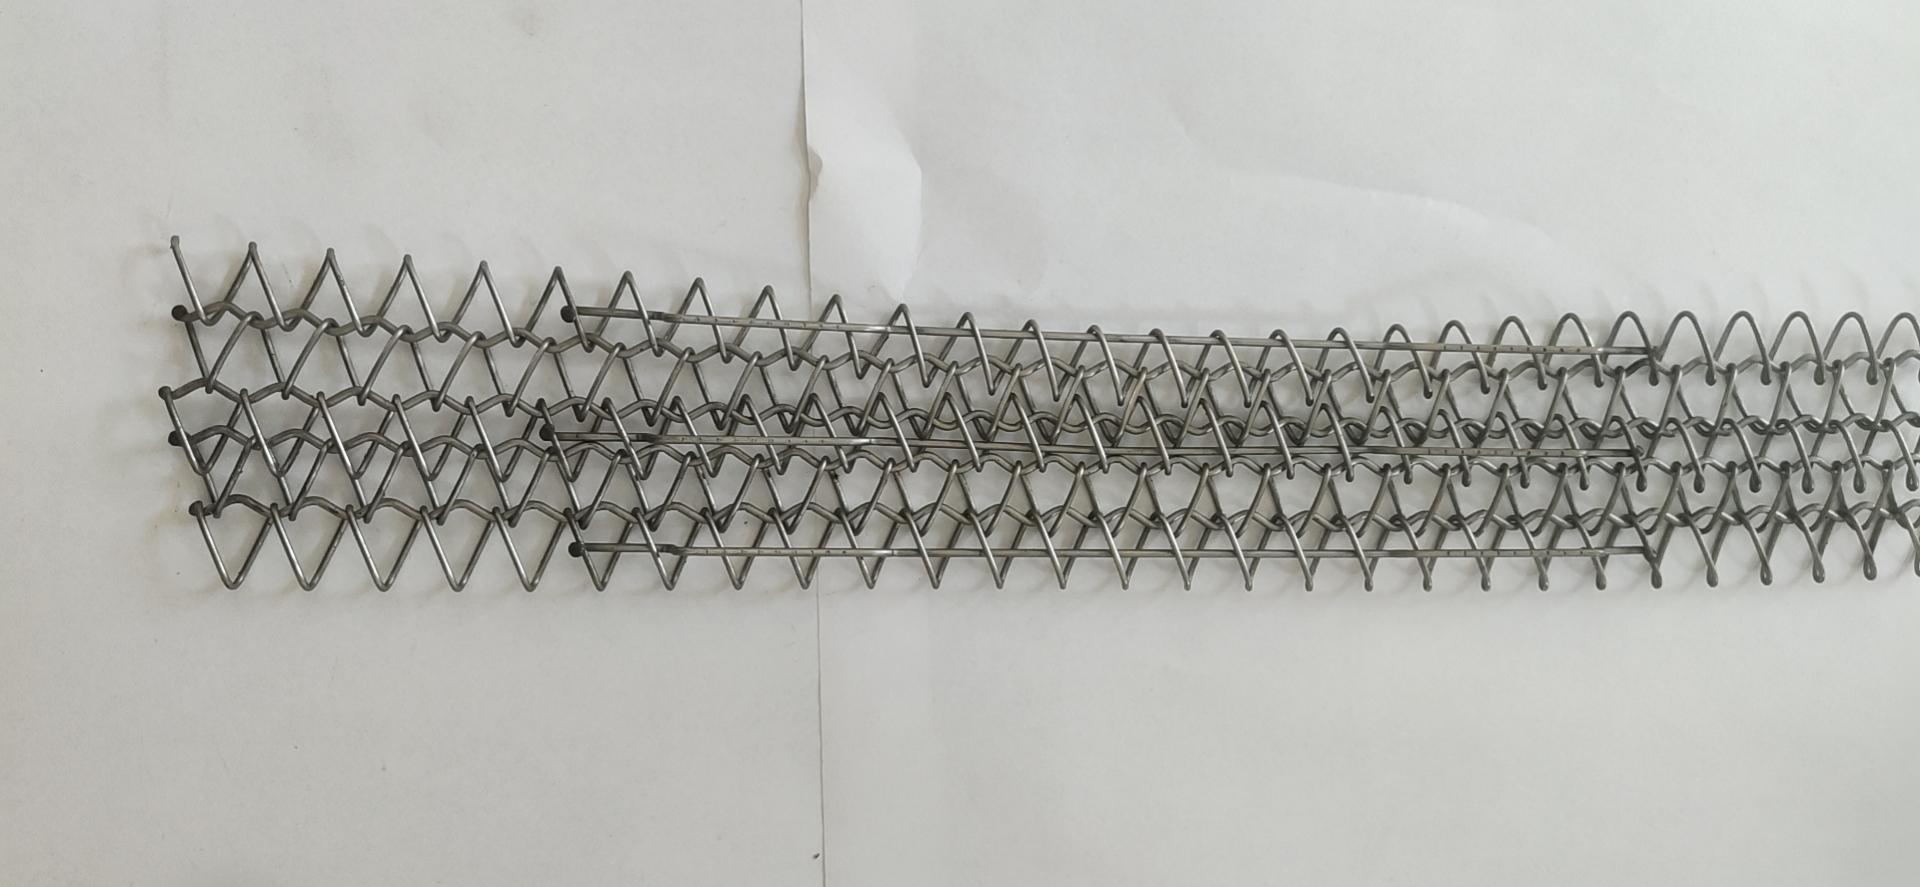 光伏网带1